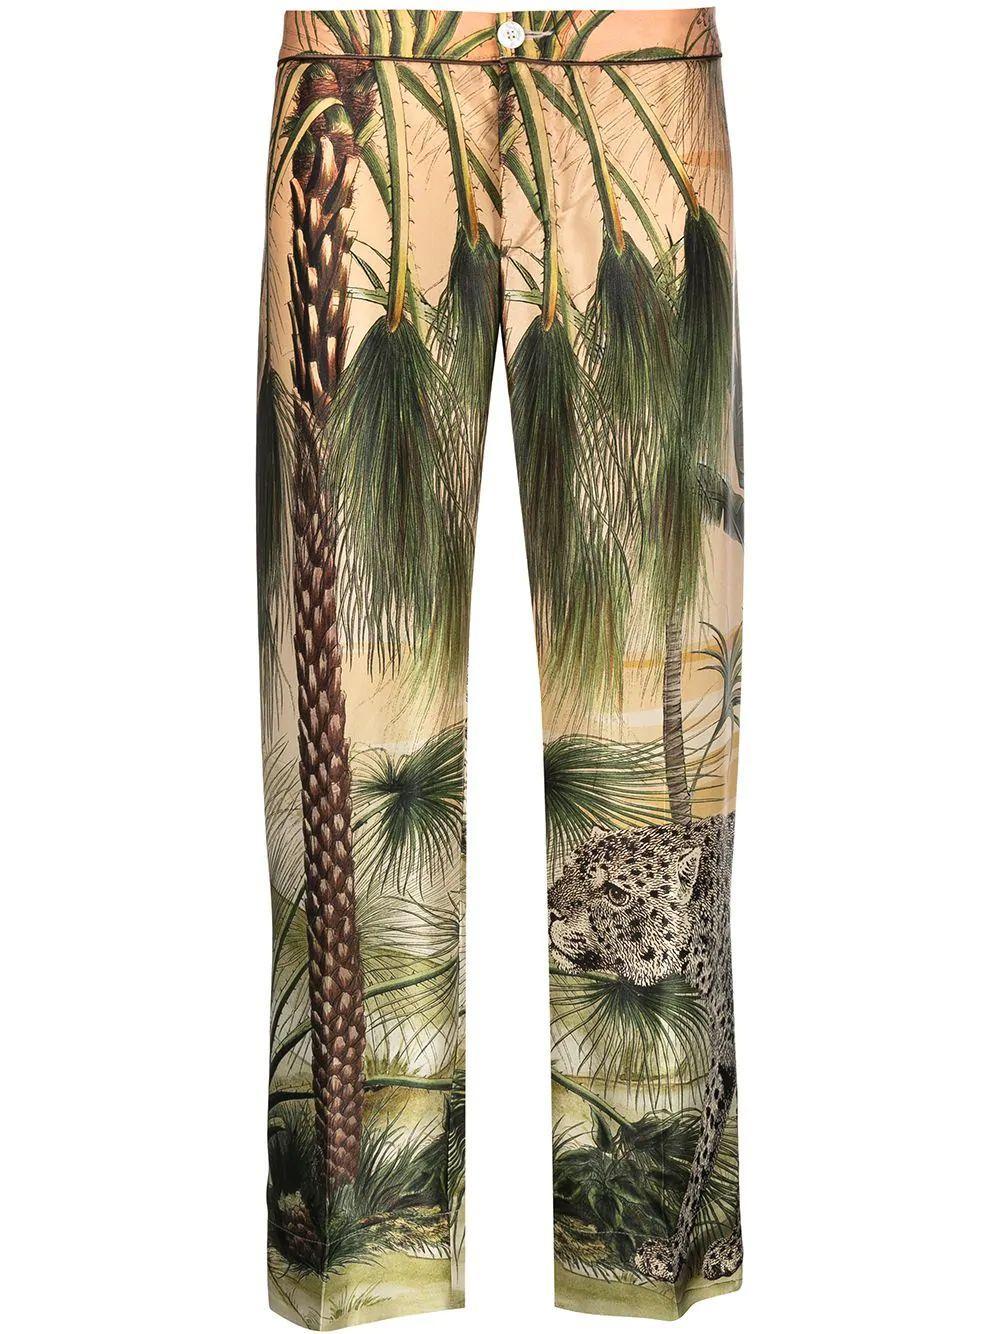 Ceo Jungle Print Pants Item # PA002073-TE00553-219